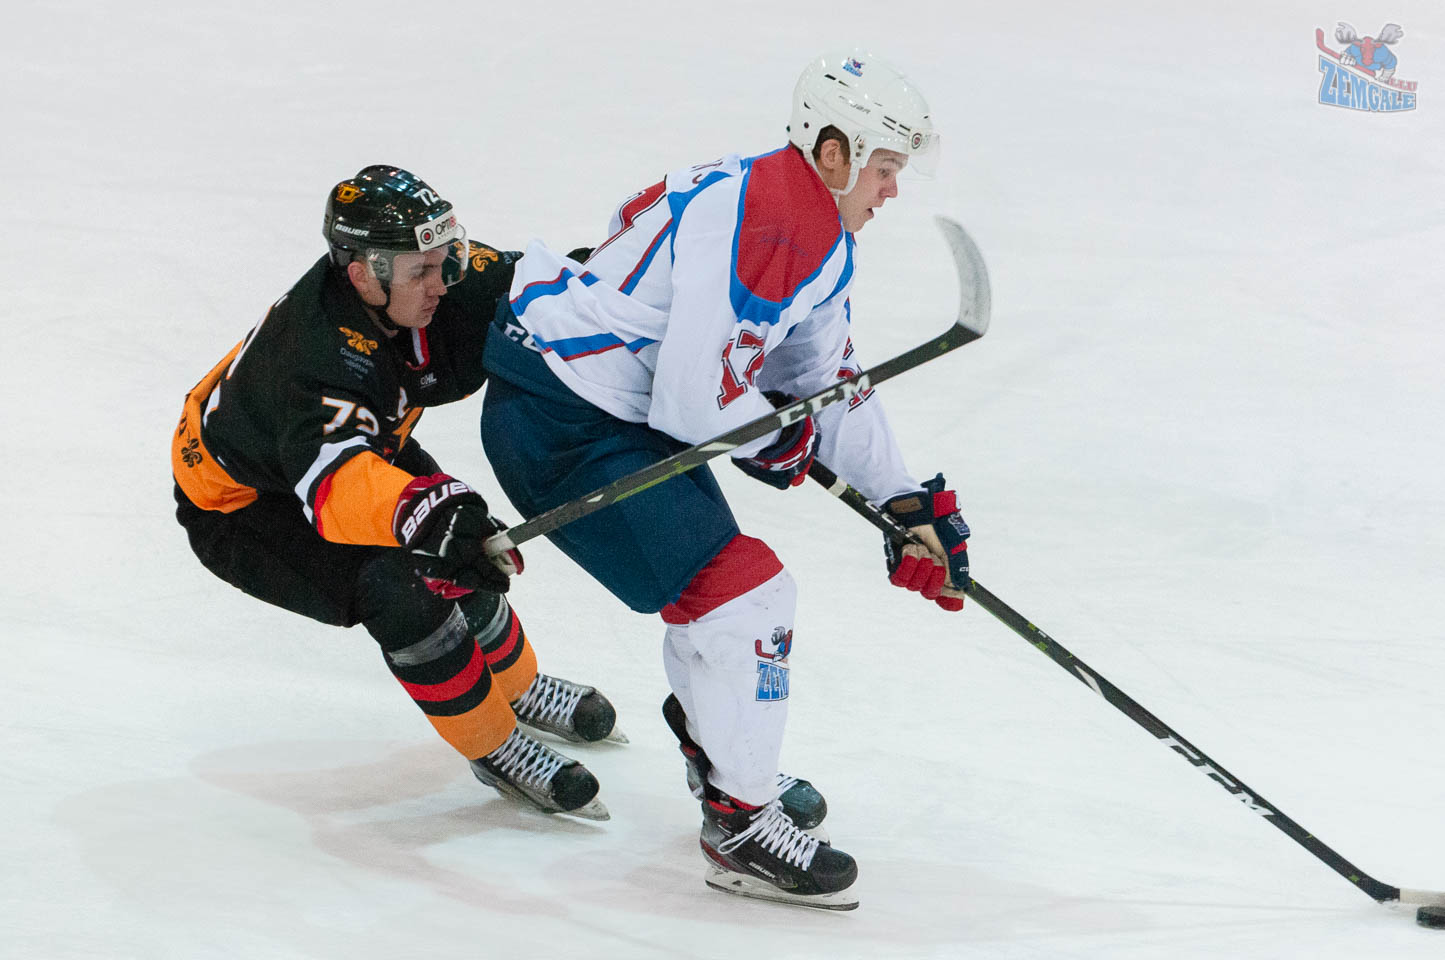 Hokejists ar korpusu piesedz ripu no pretinieka